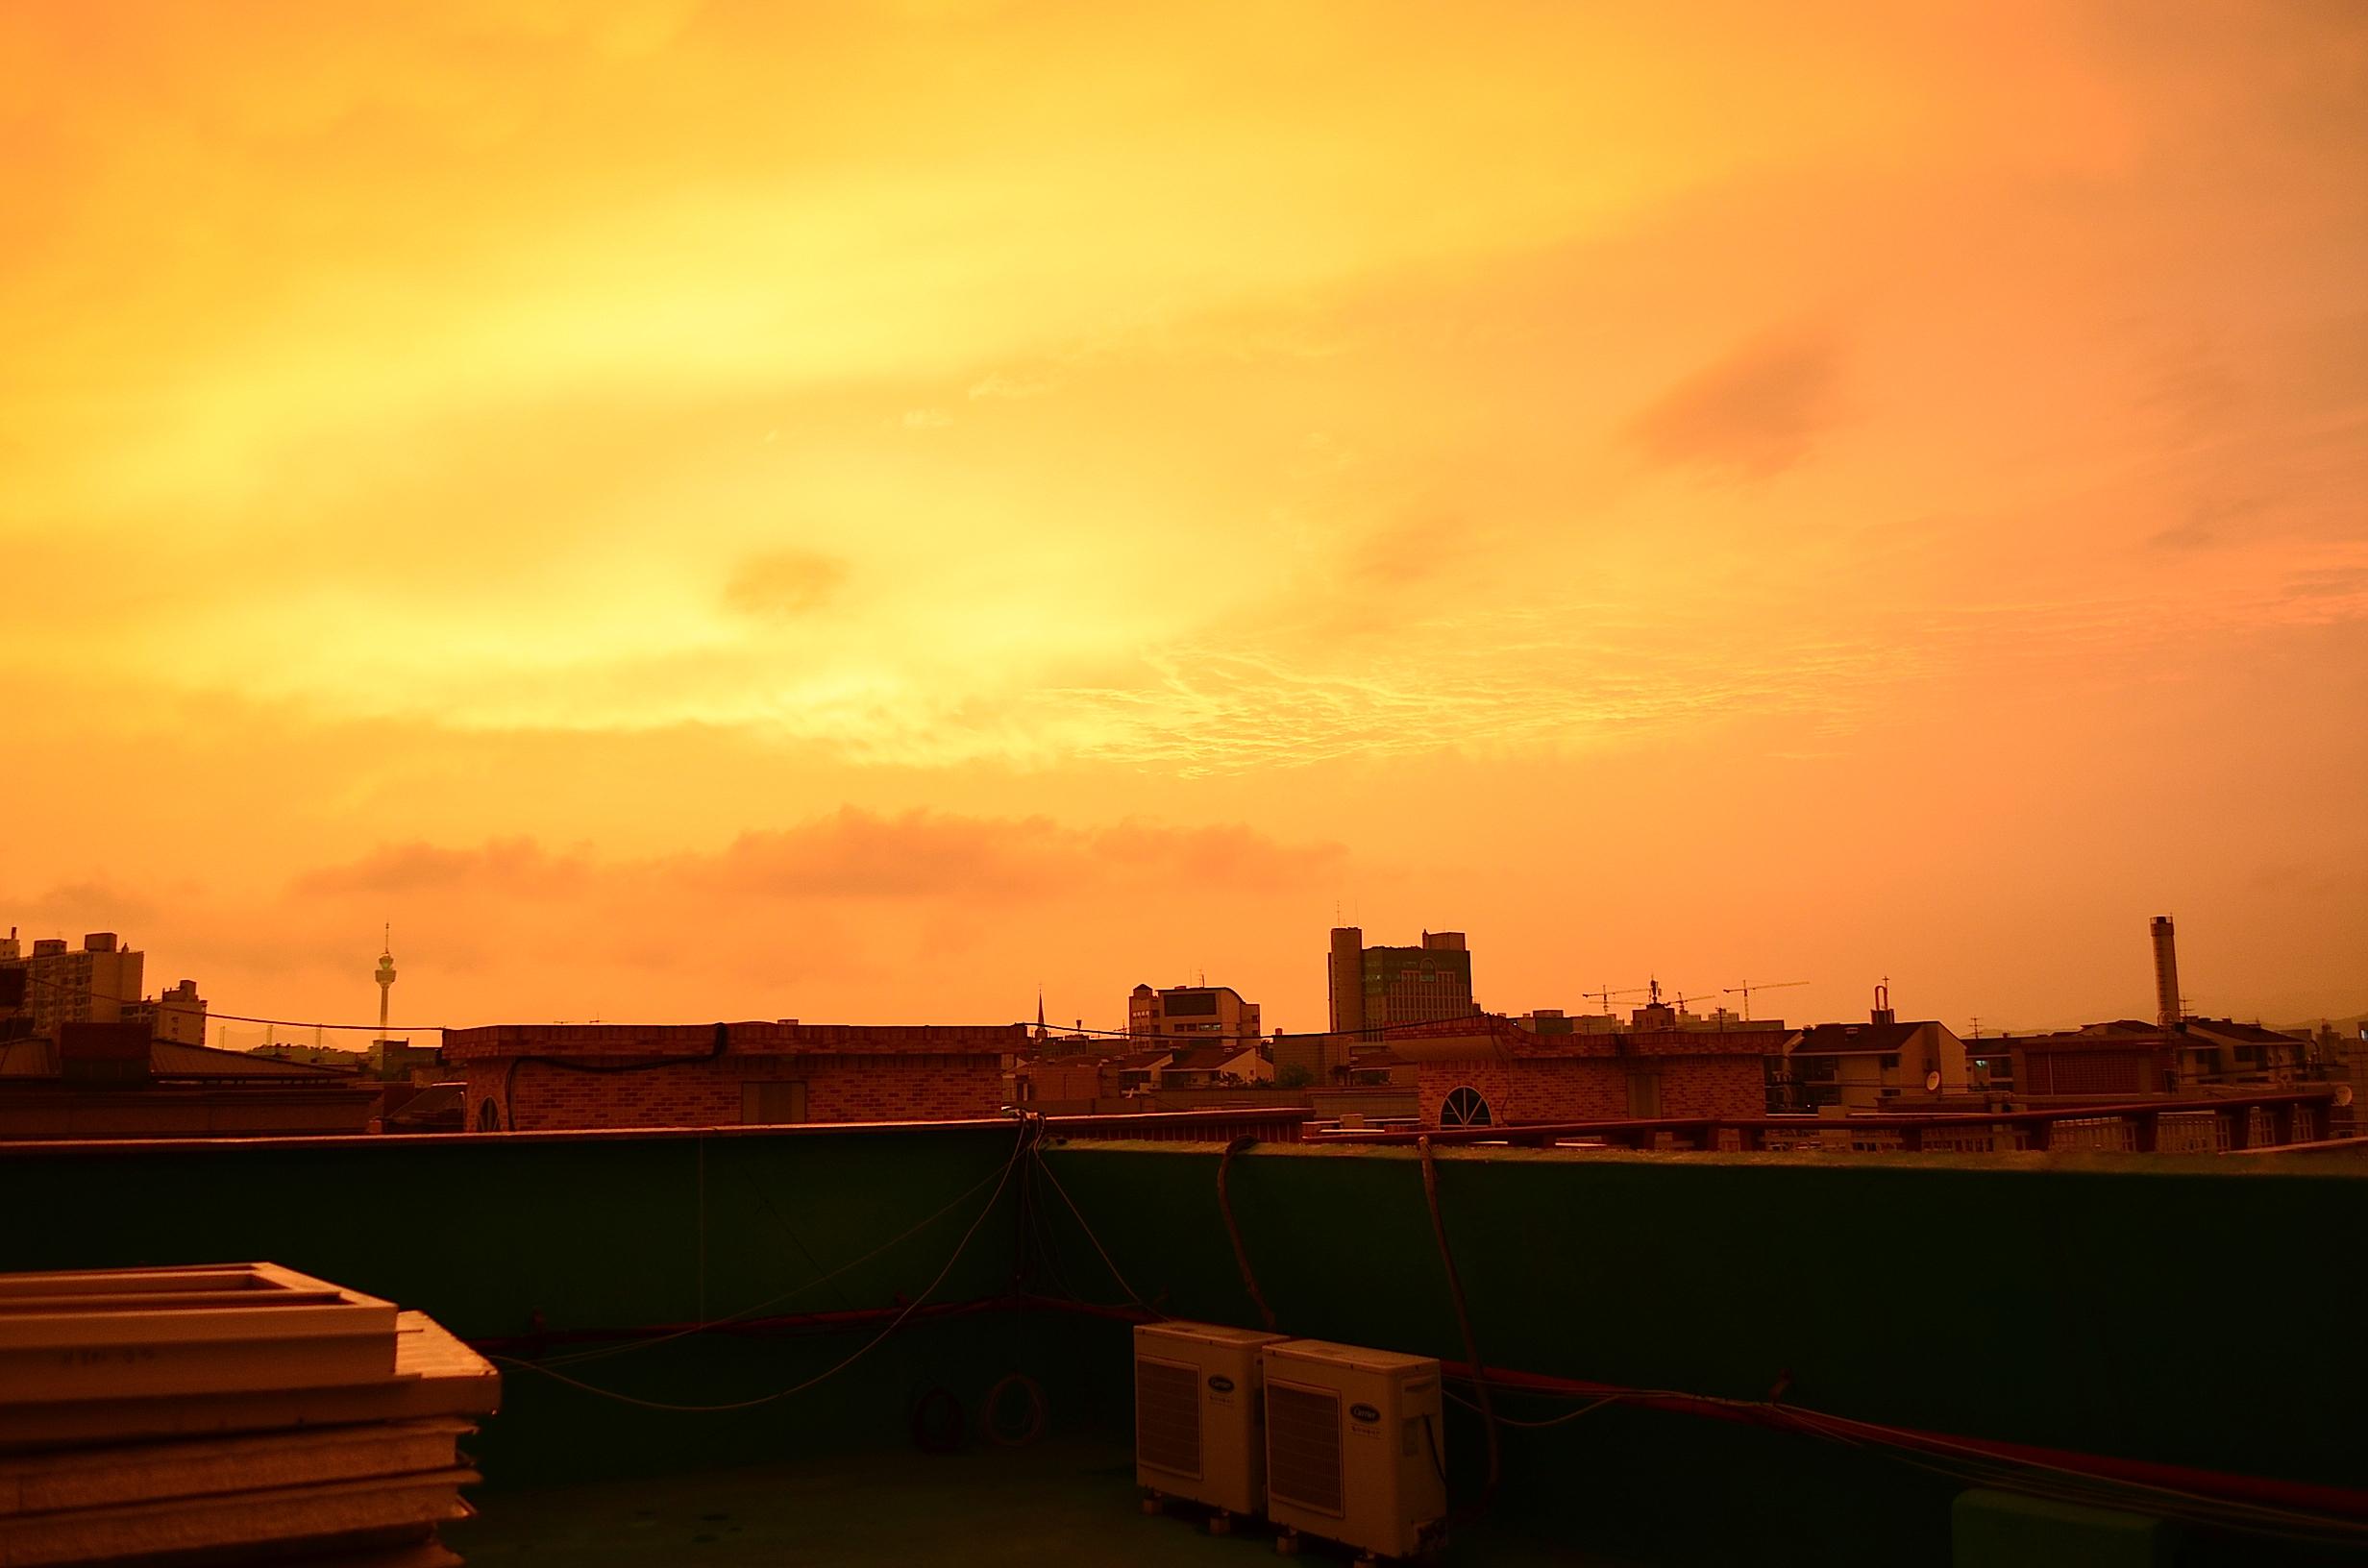 And the sky burned | Koreabridge